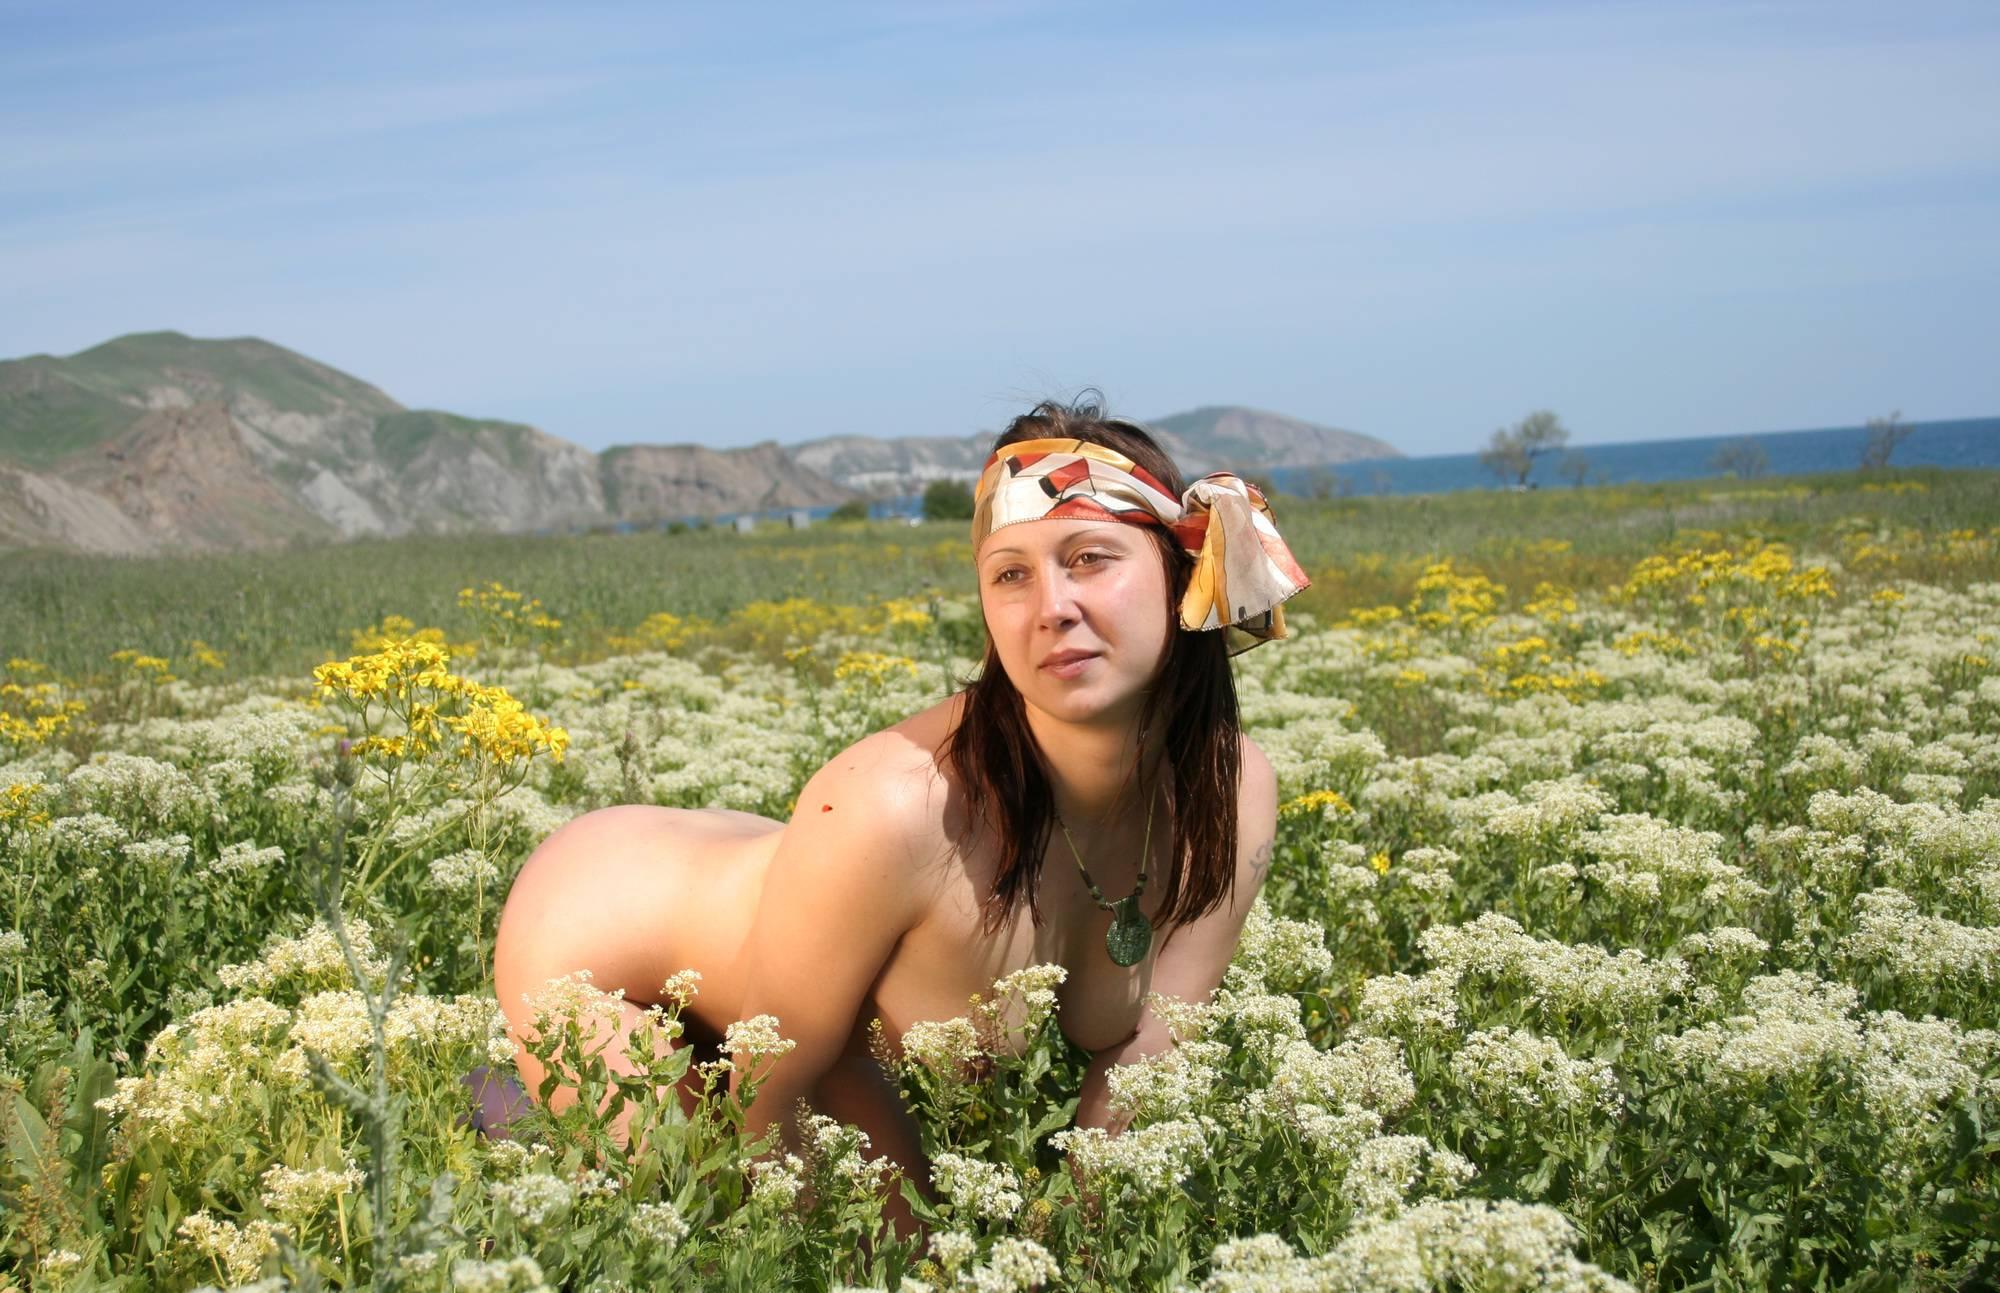 Naturist Fields of Dreams - 1